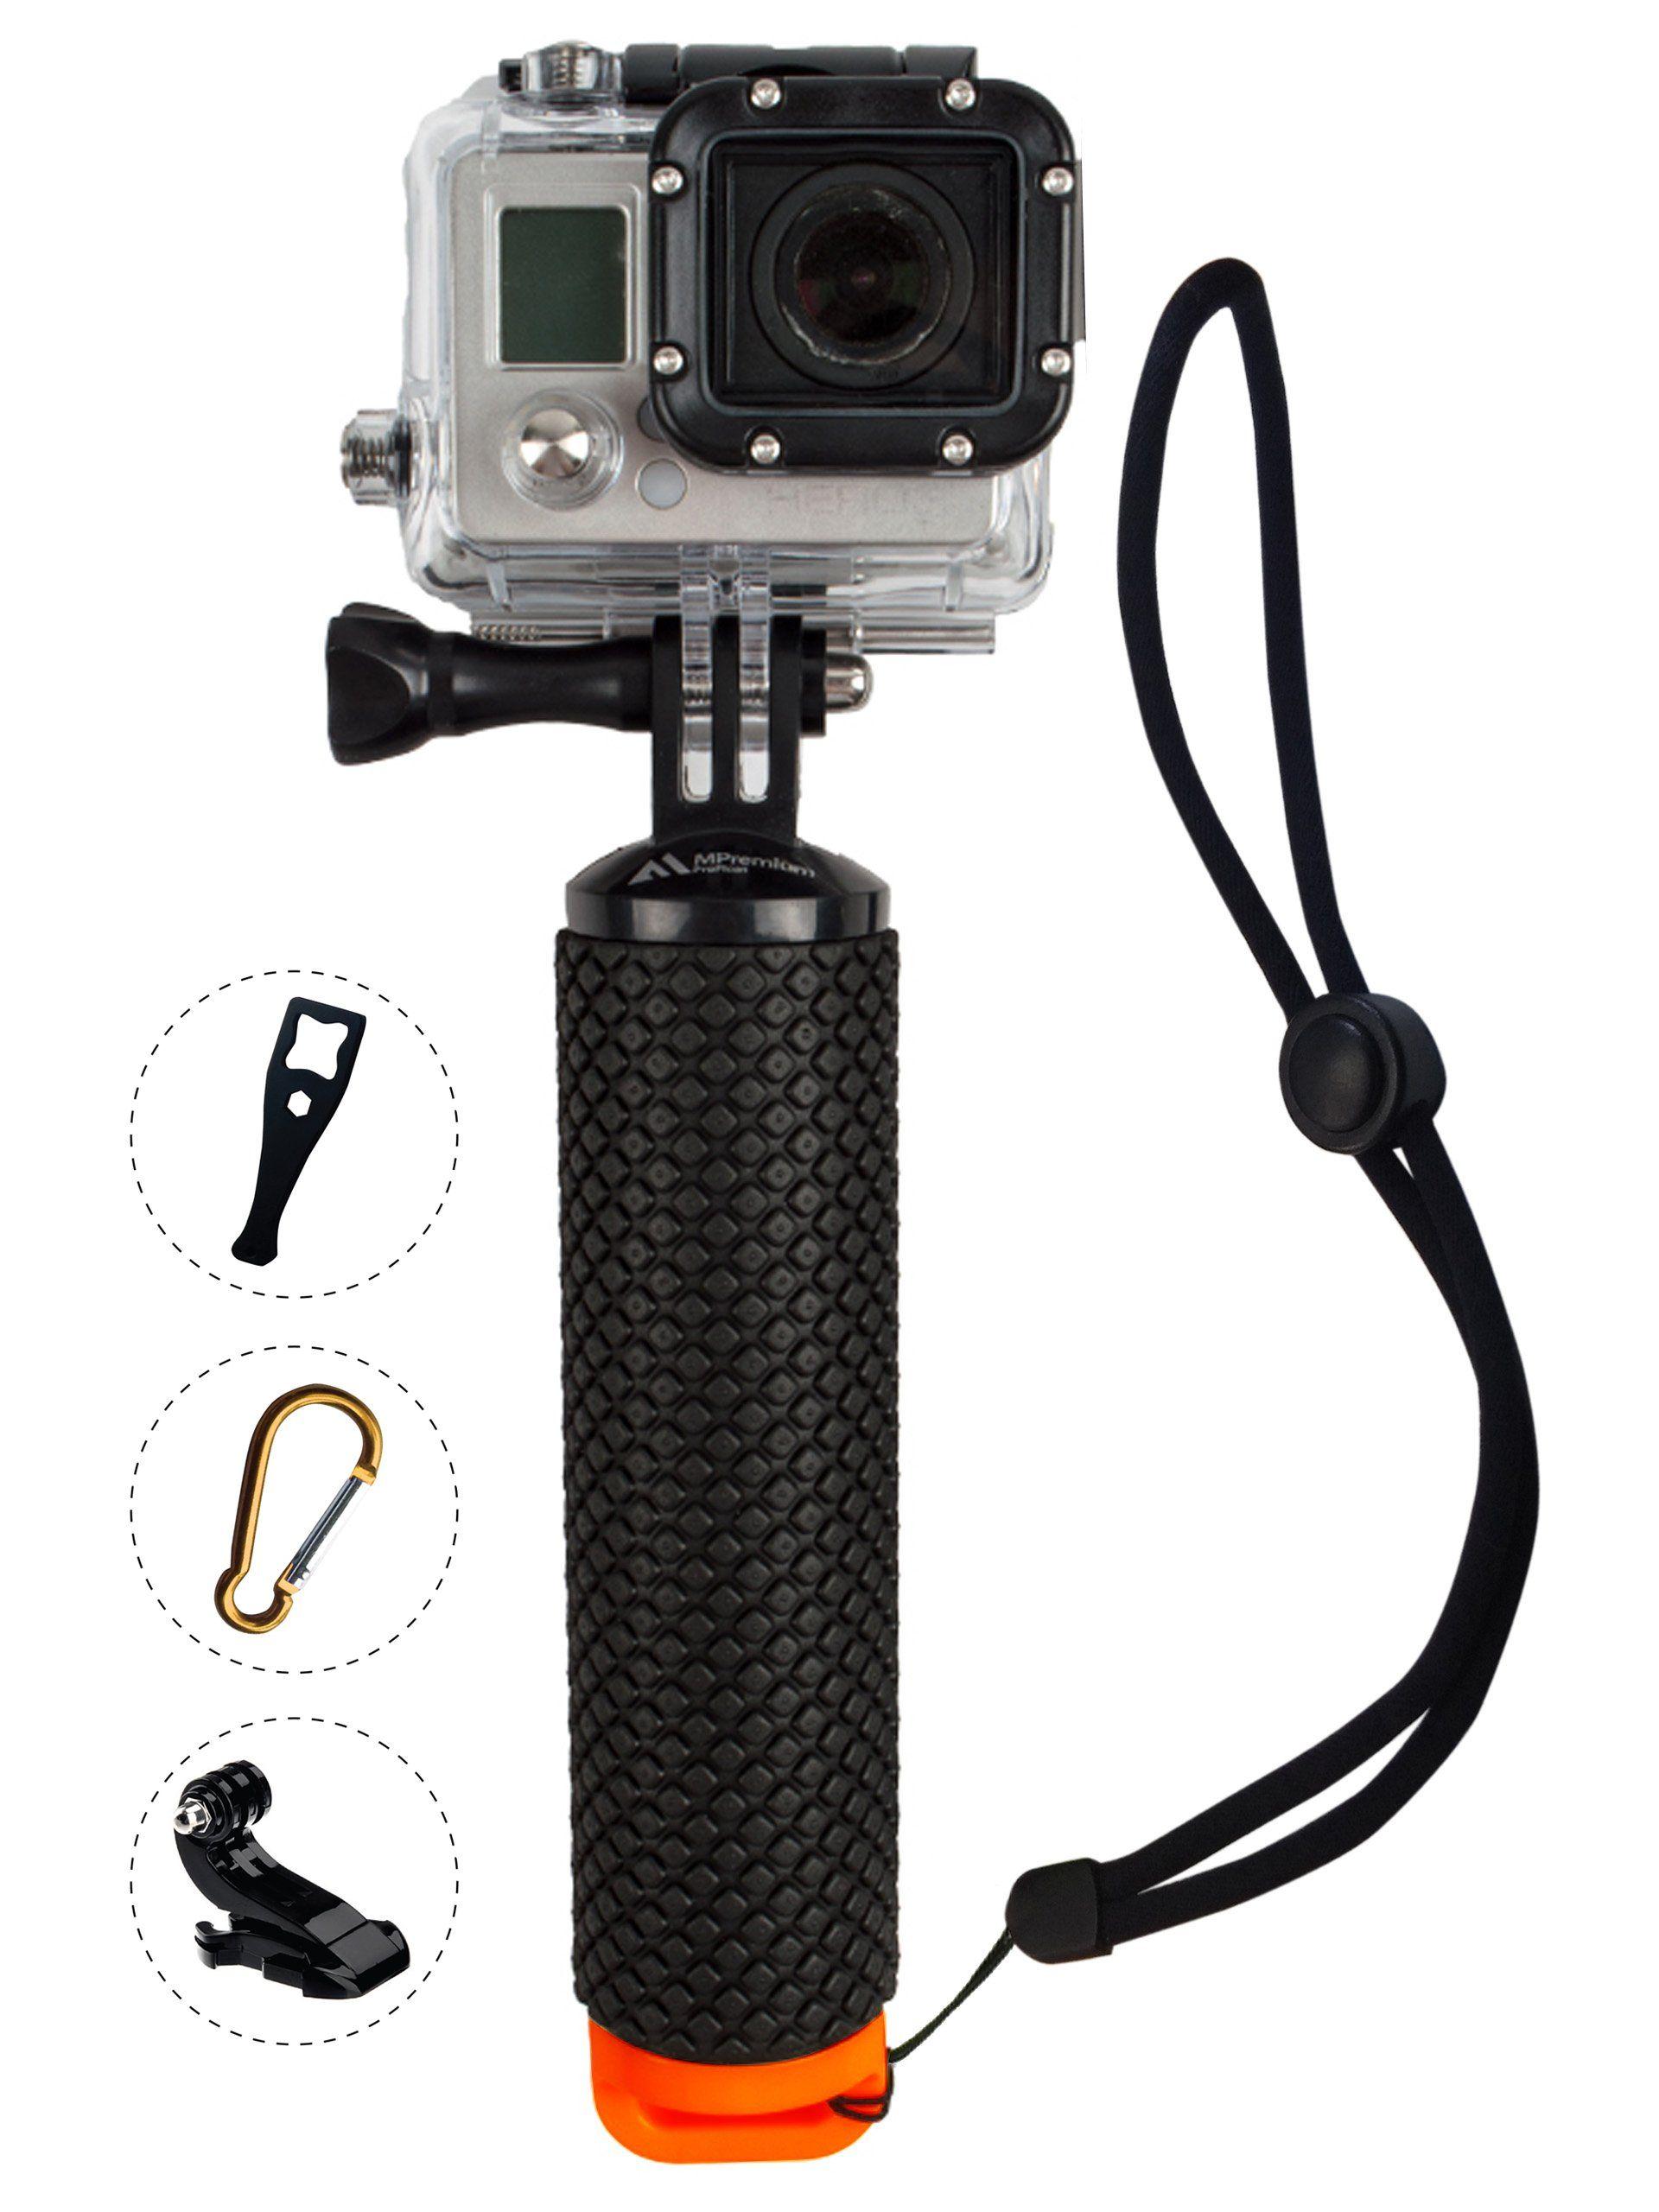 Waterproof Floating Selfie Stick Monopod Pole Hand Grip For GoPro 5 4 3 2 Camera